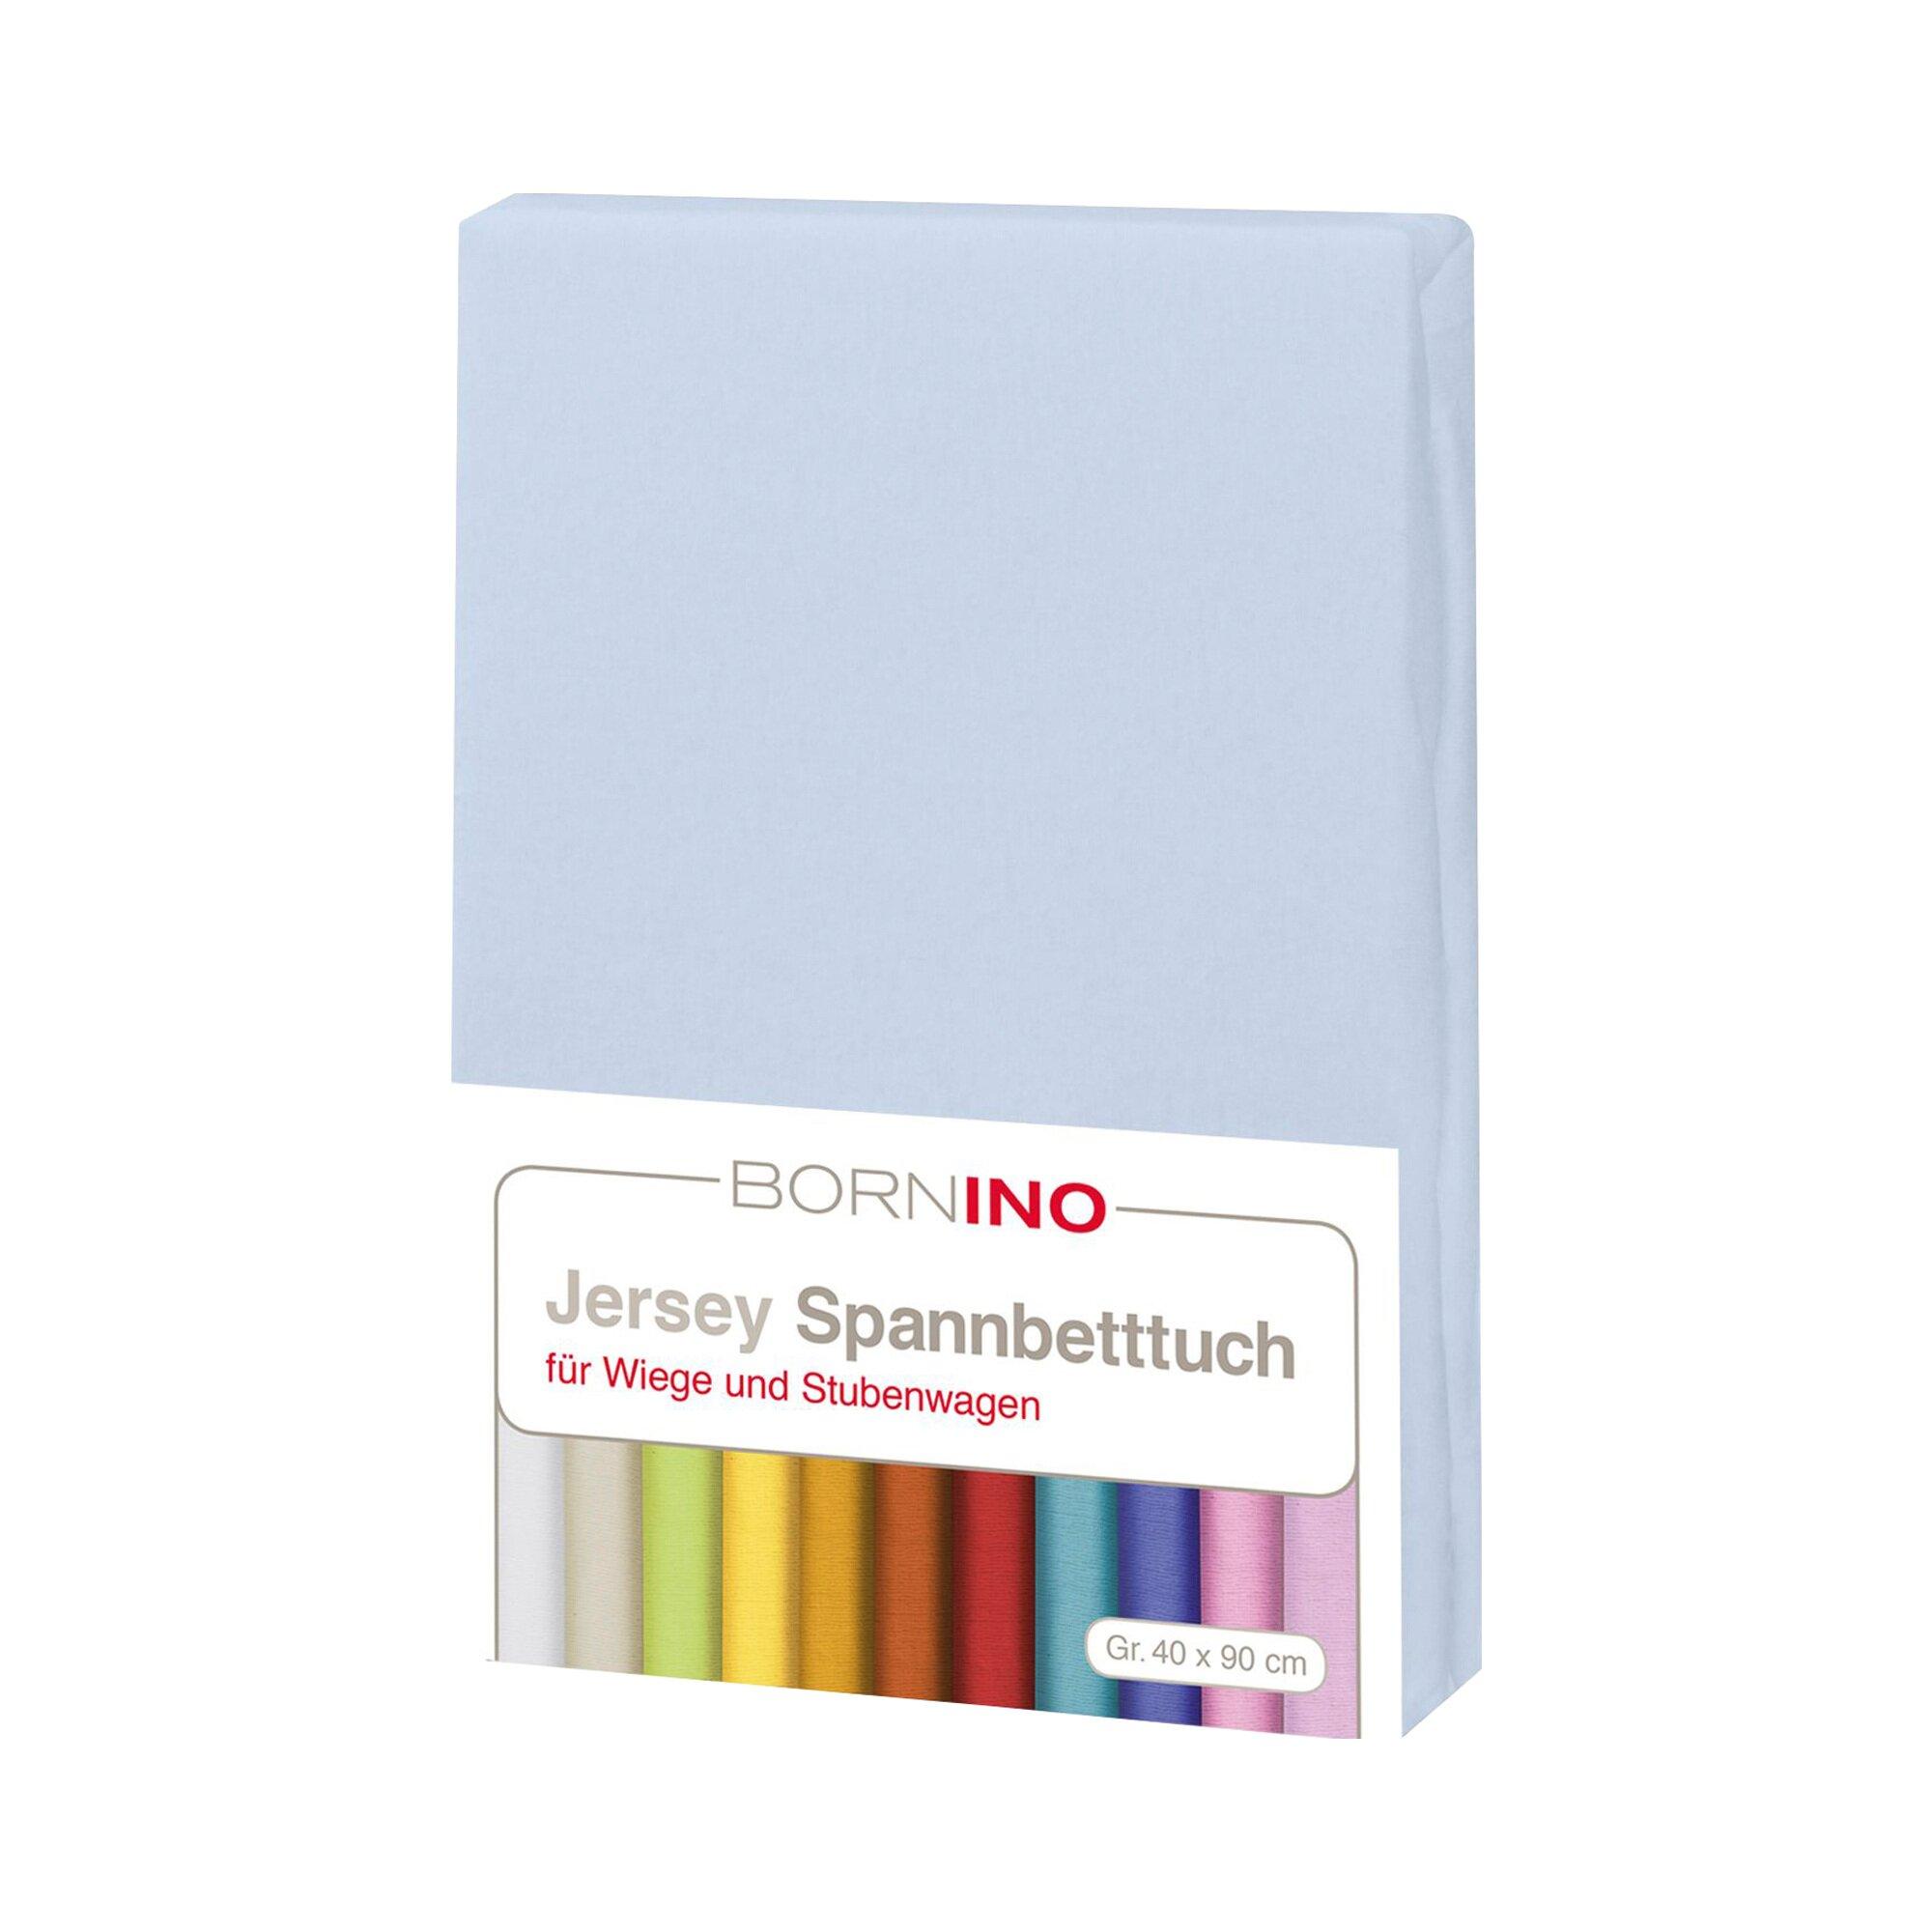 Bornino Home Jersey-Spannbetttuch 40x90 cm blau